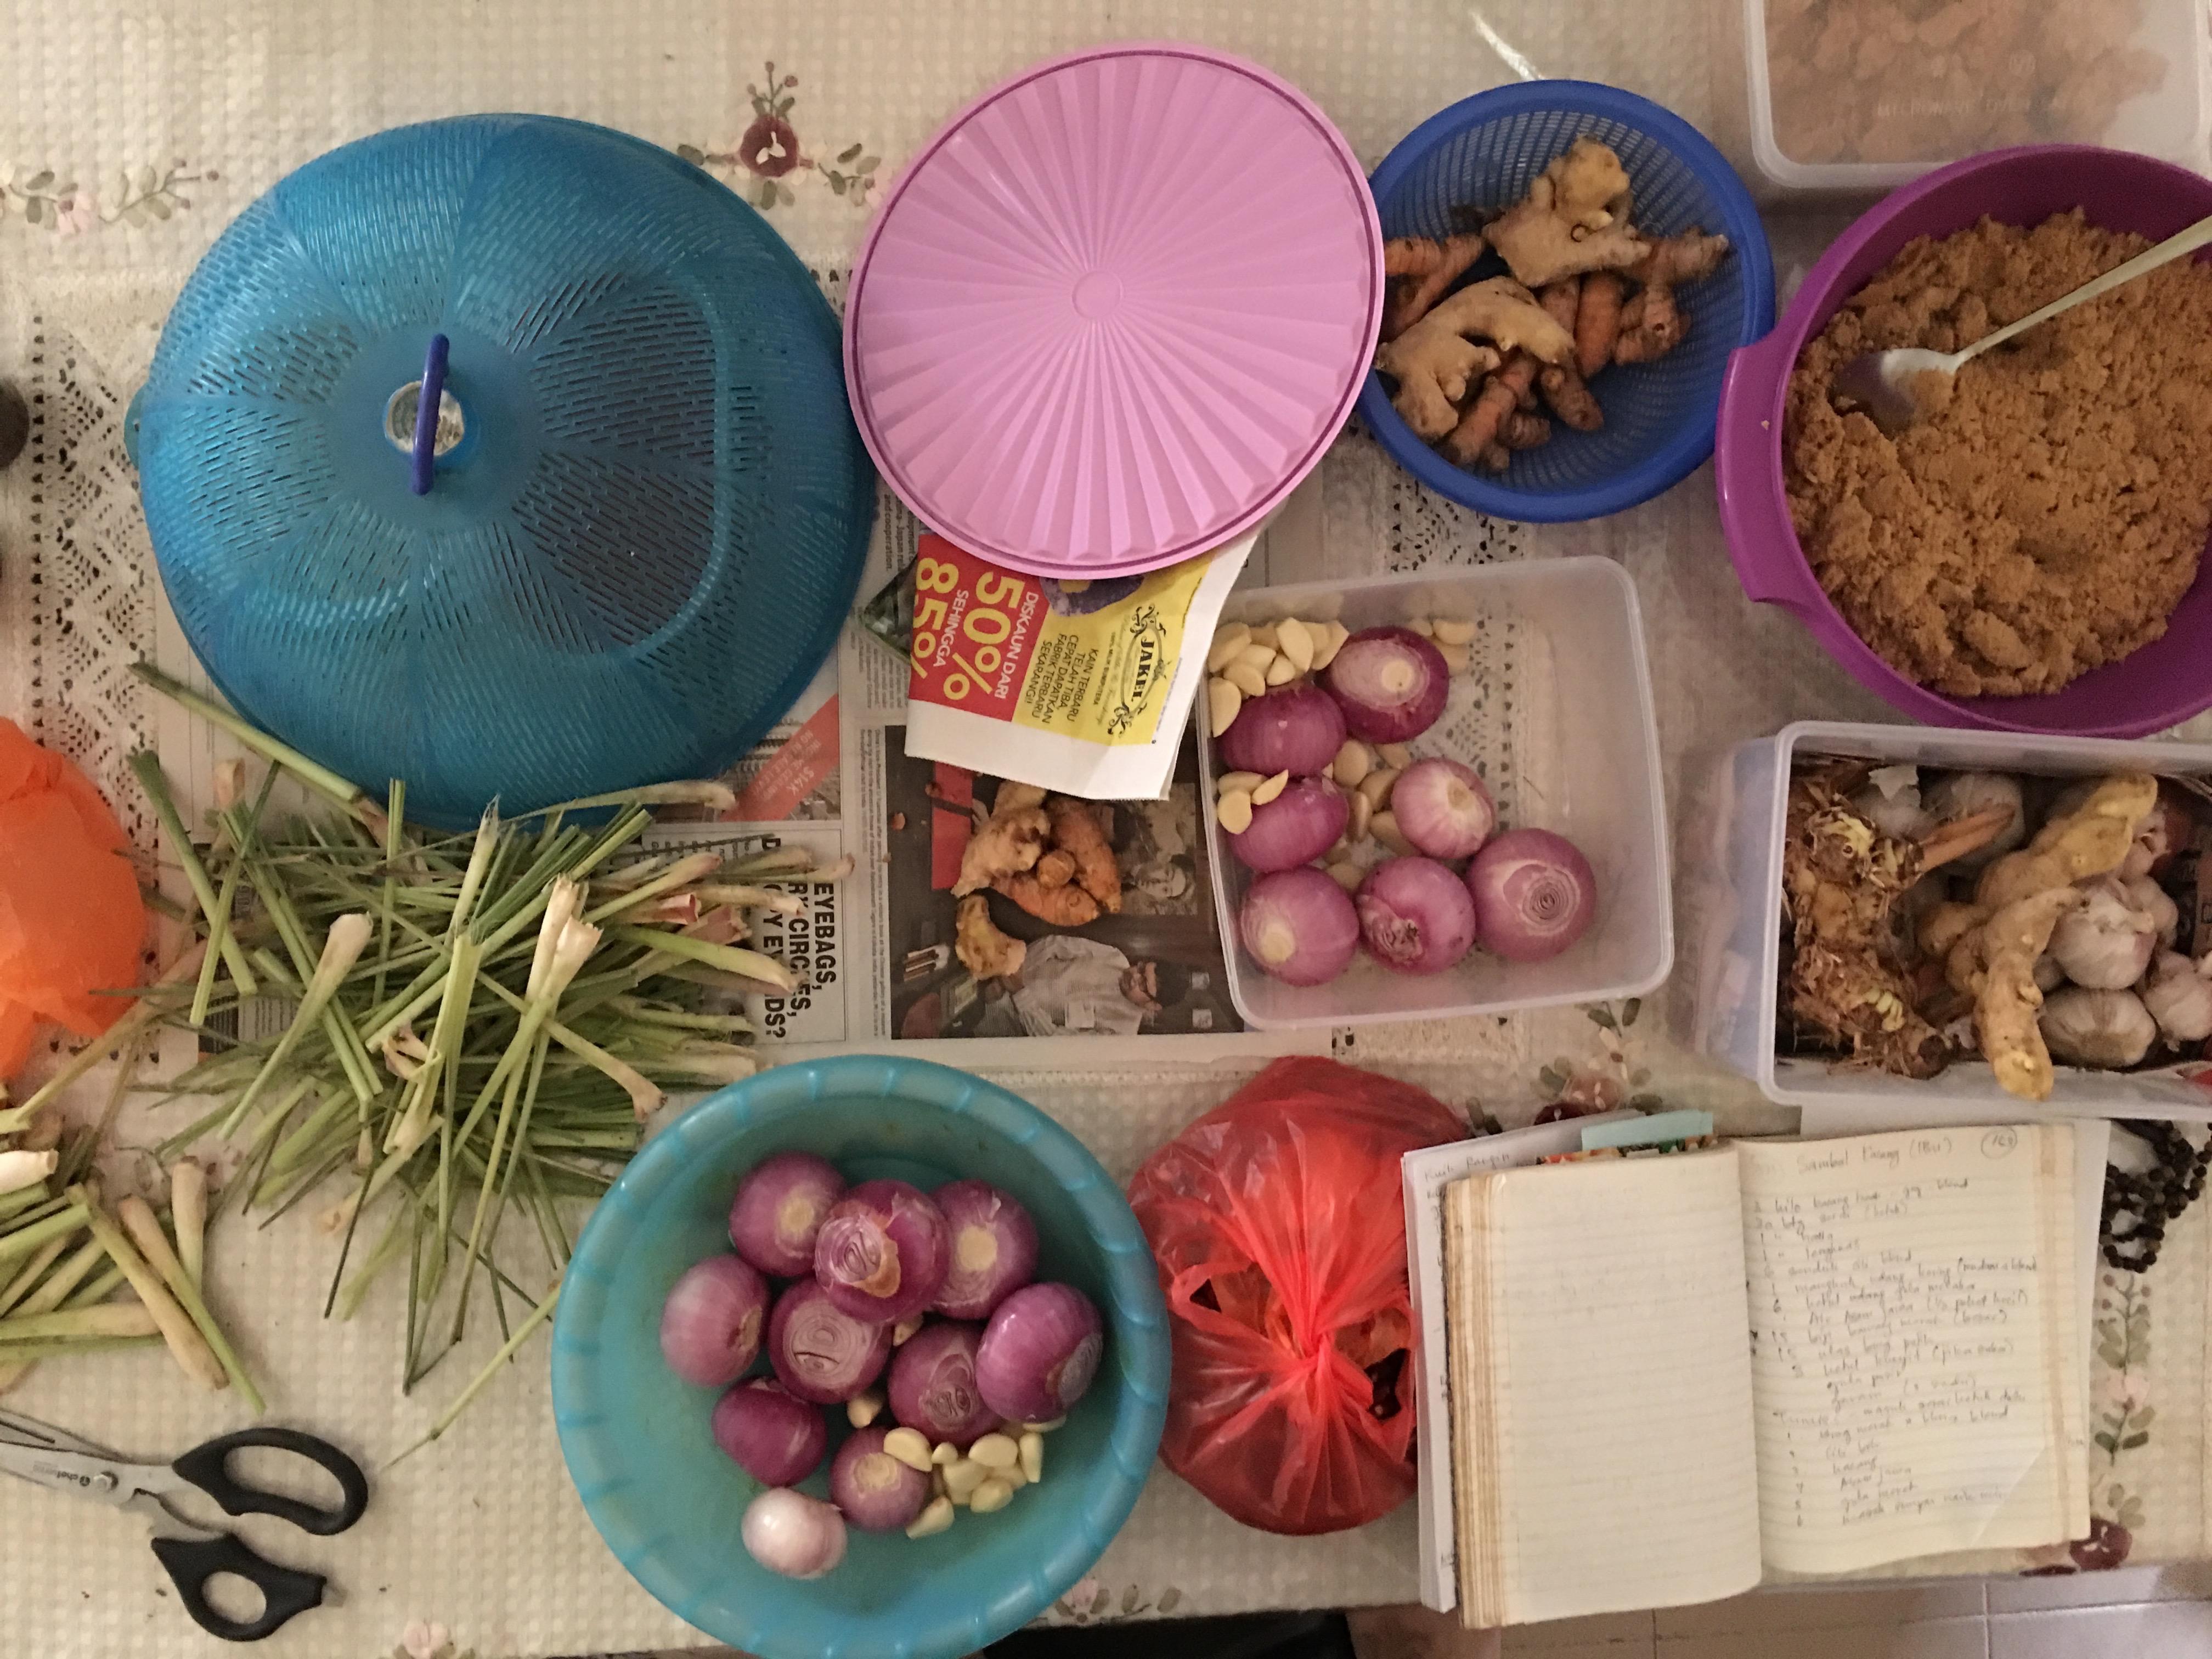 Resipi Sambal Kacang Tradisional Senang dan Sedap